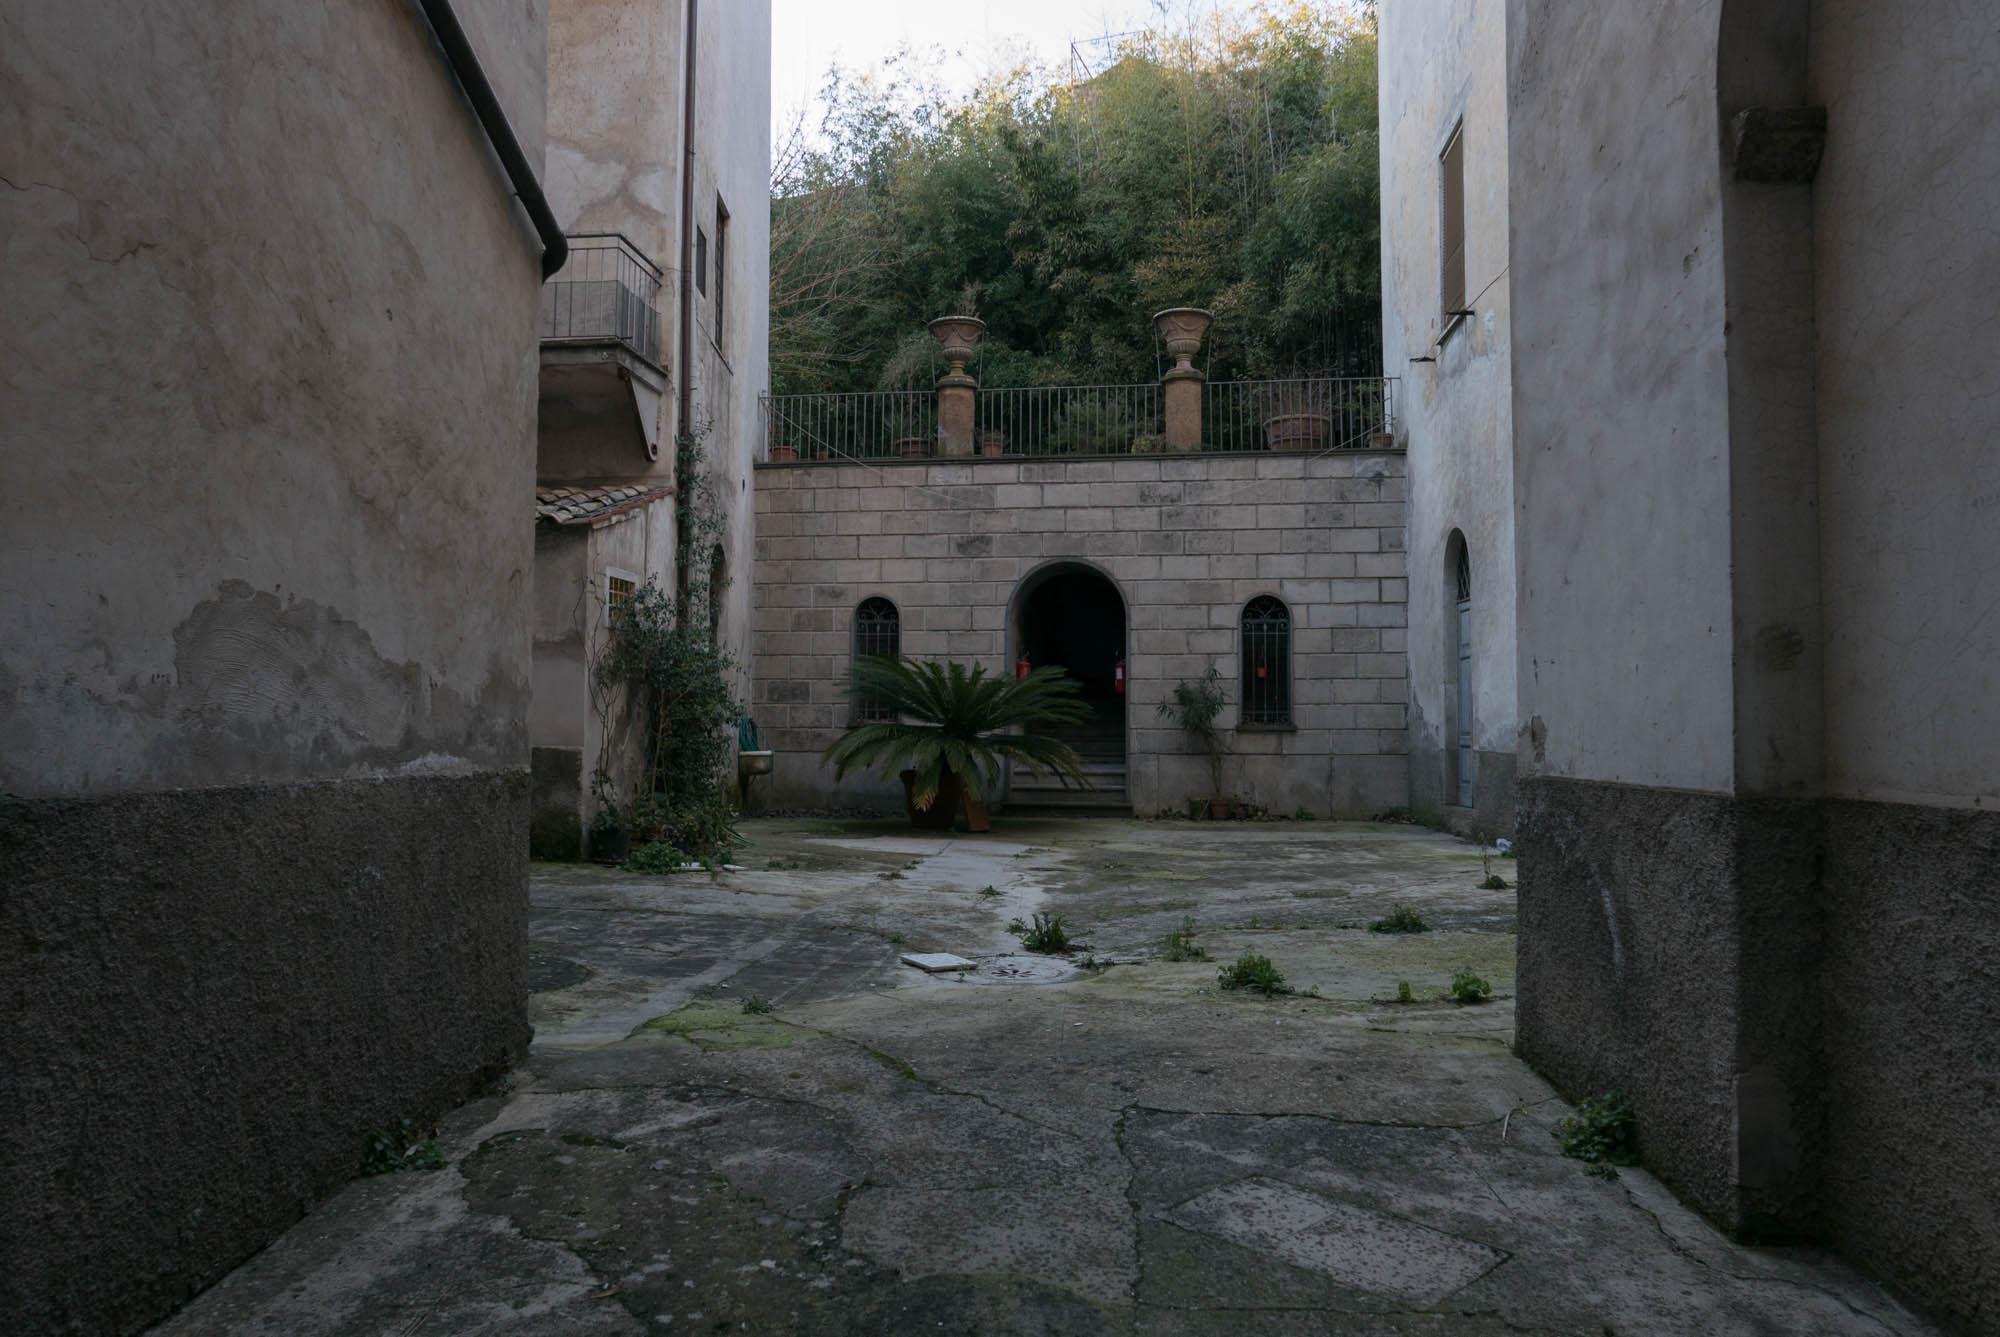 sigmund_freud in orvieto-belle_-arti patrick richmond nicholas